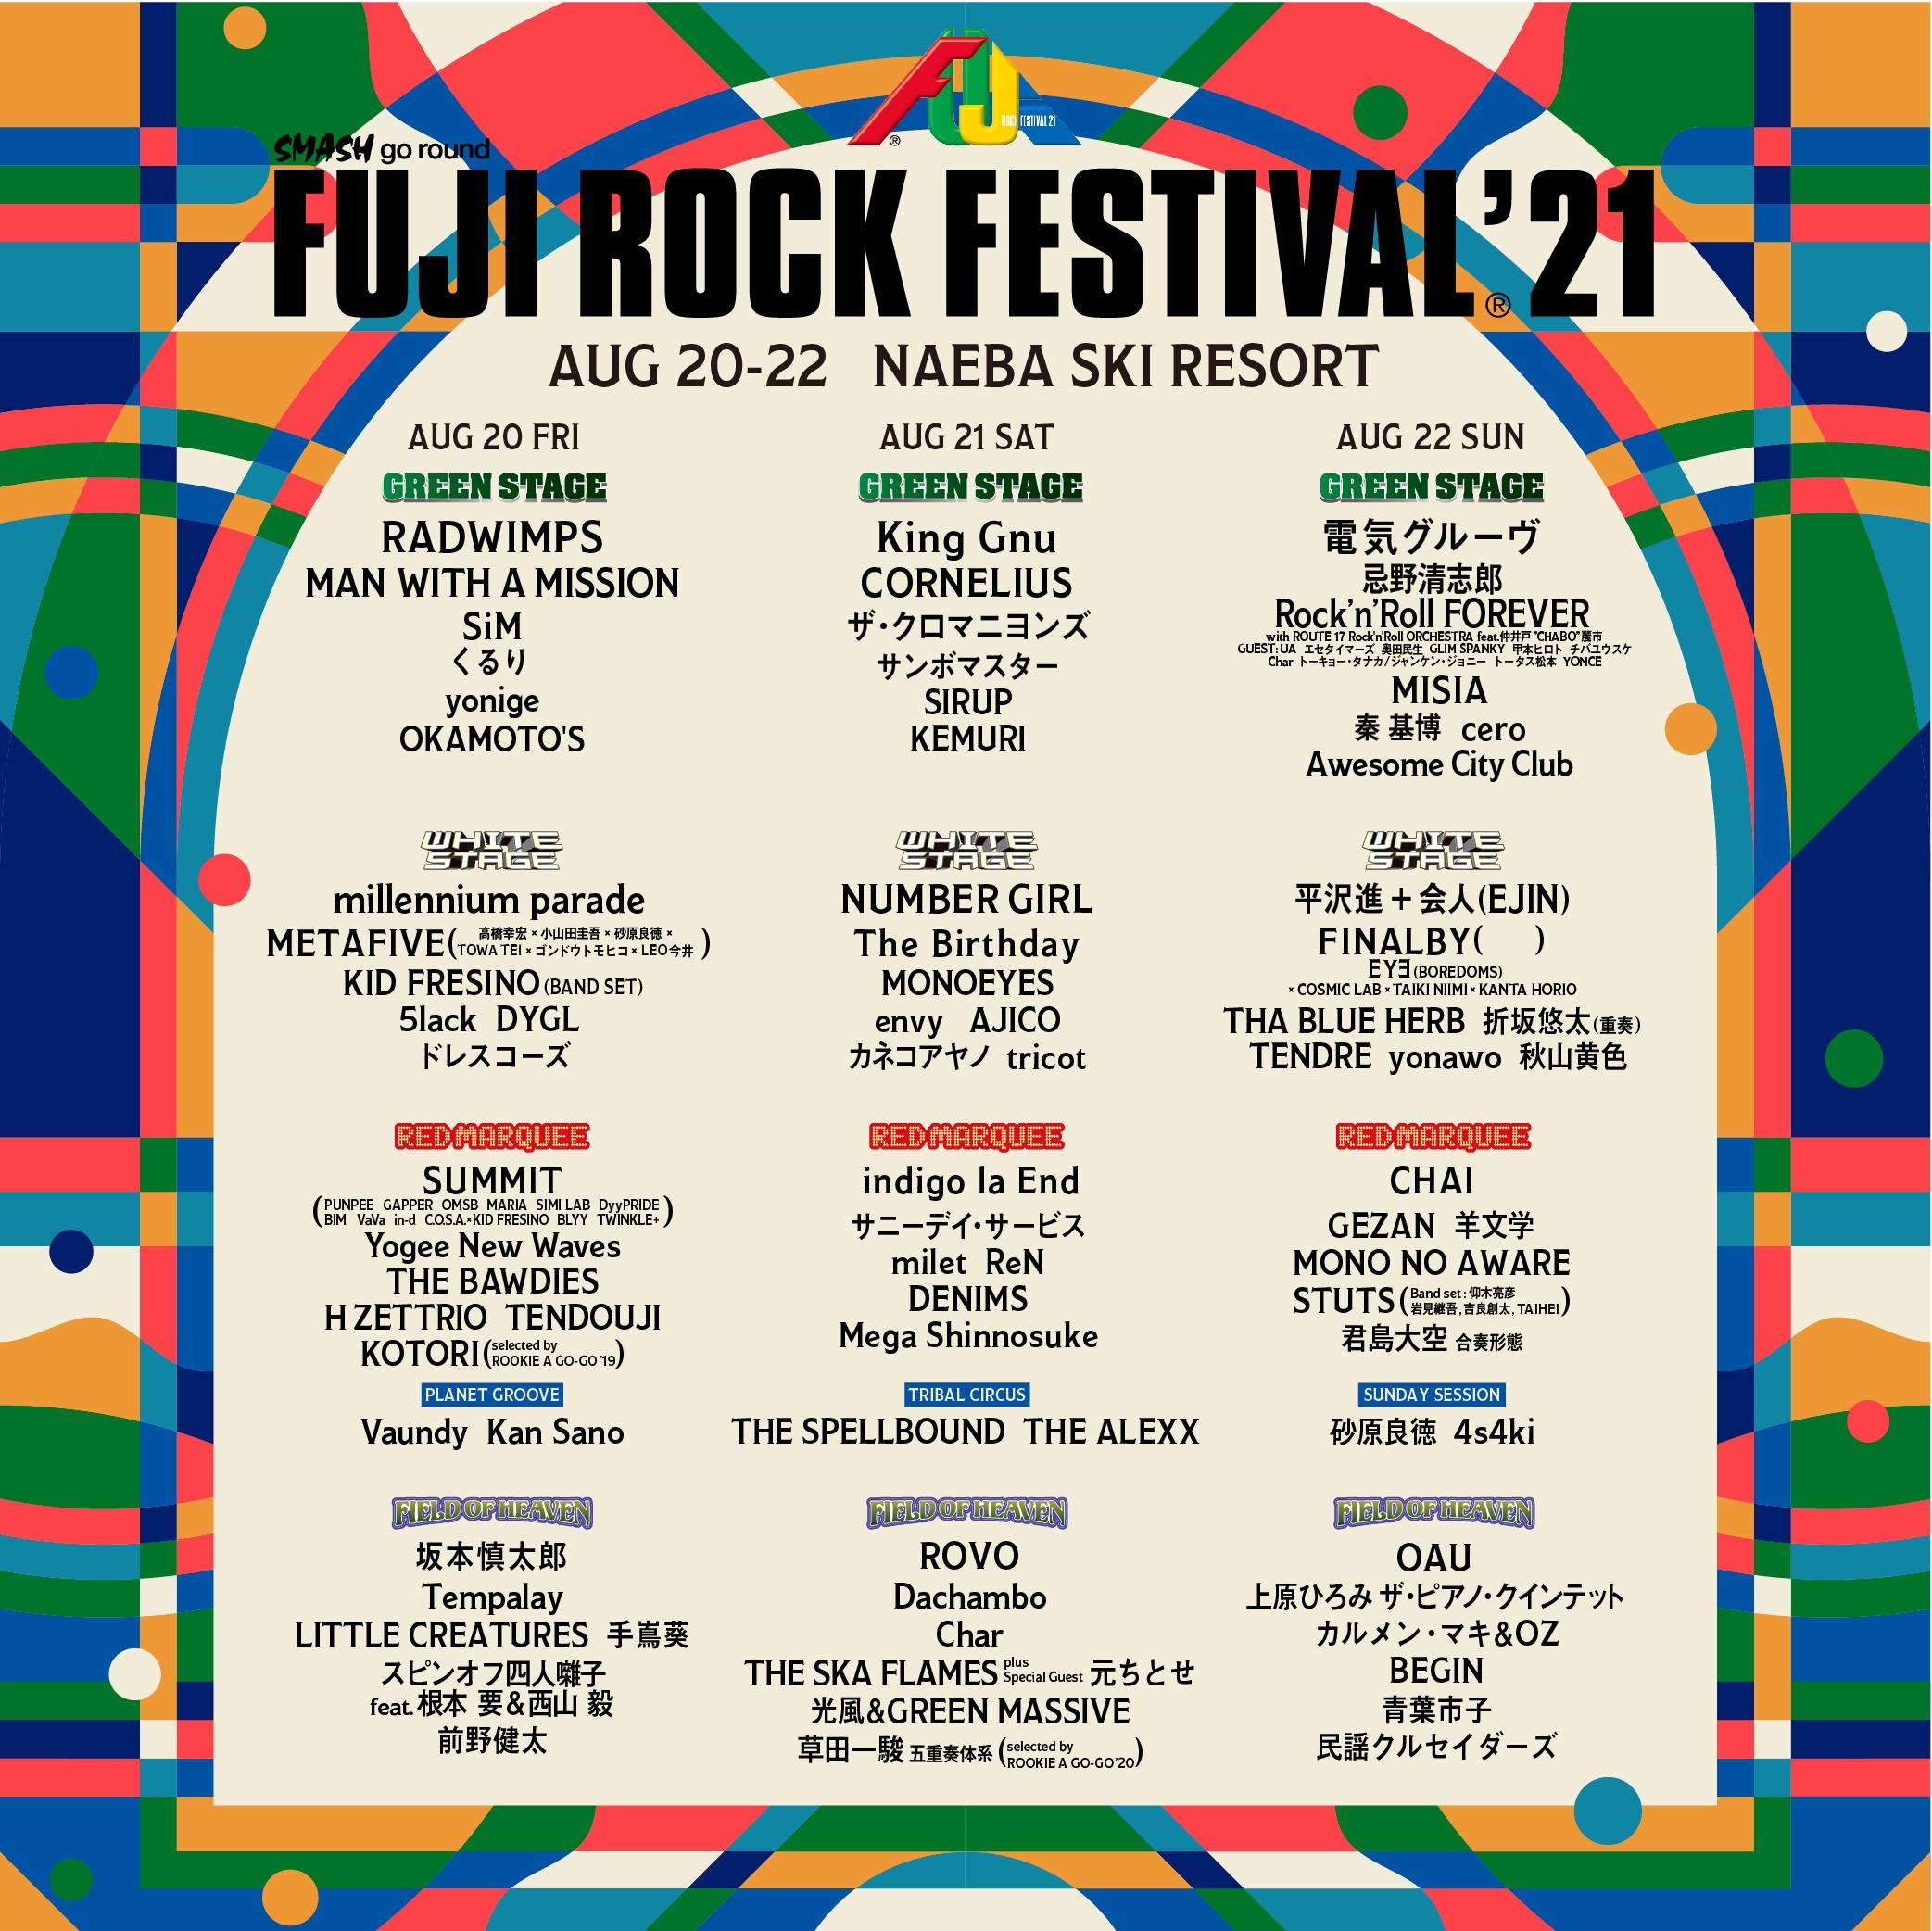 『FUJI ROCK FESTIVAL '21』